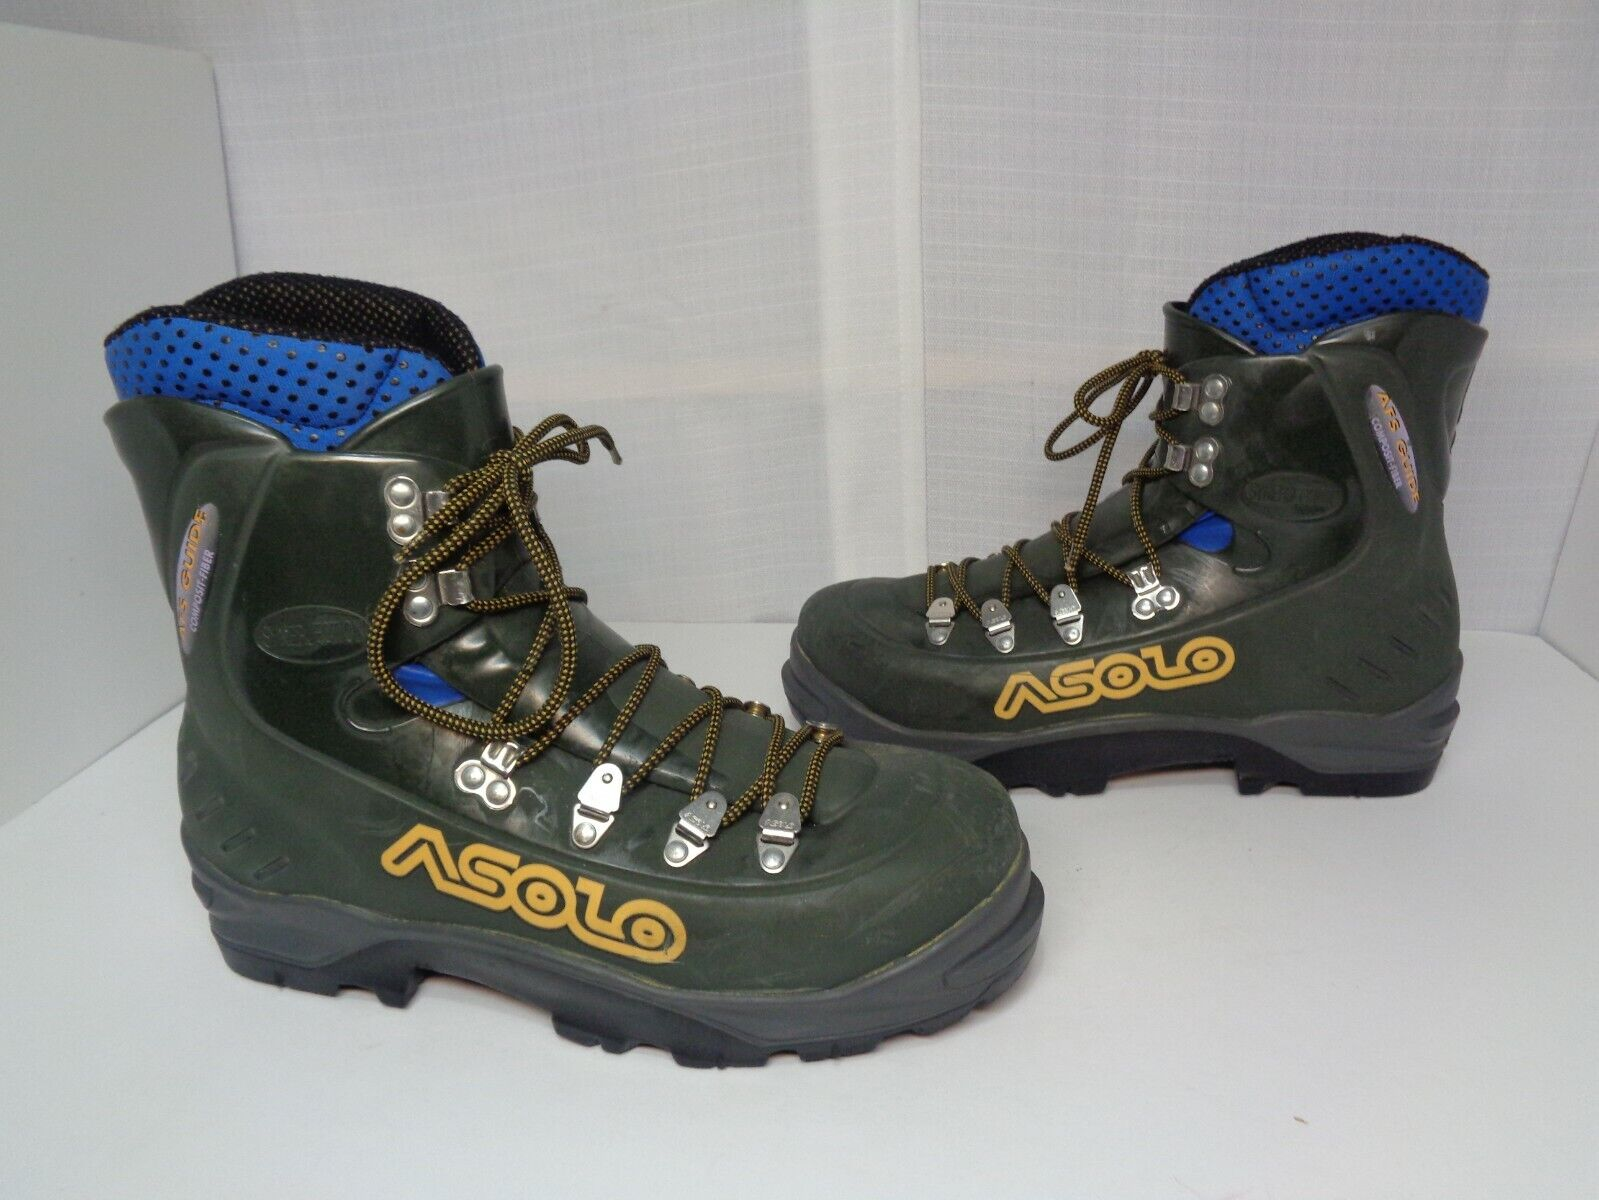 Para Hombre botas Asolo 51701 Montañismo AFS guía Talla 8-Hecho en Italia